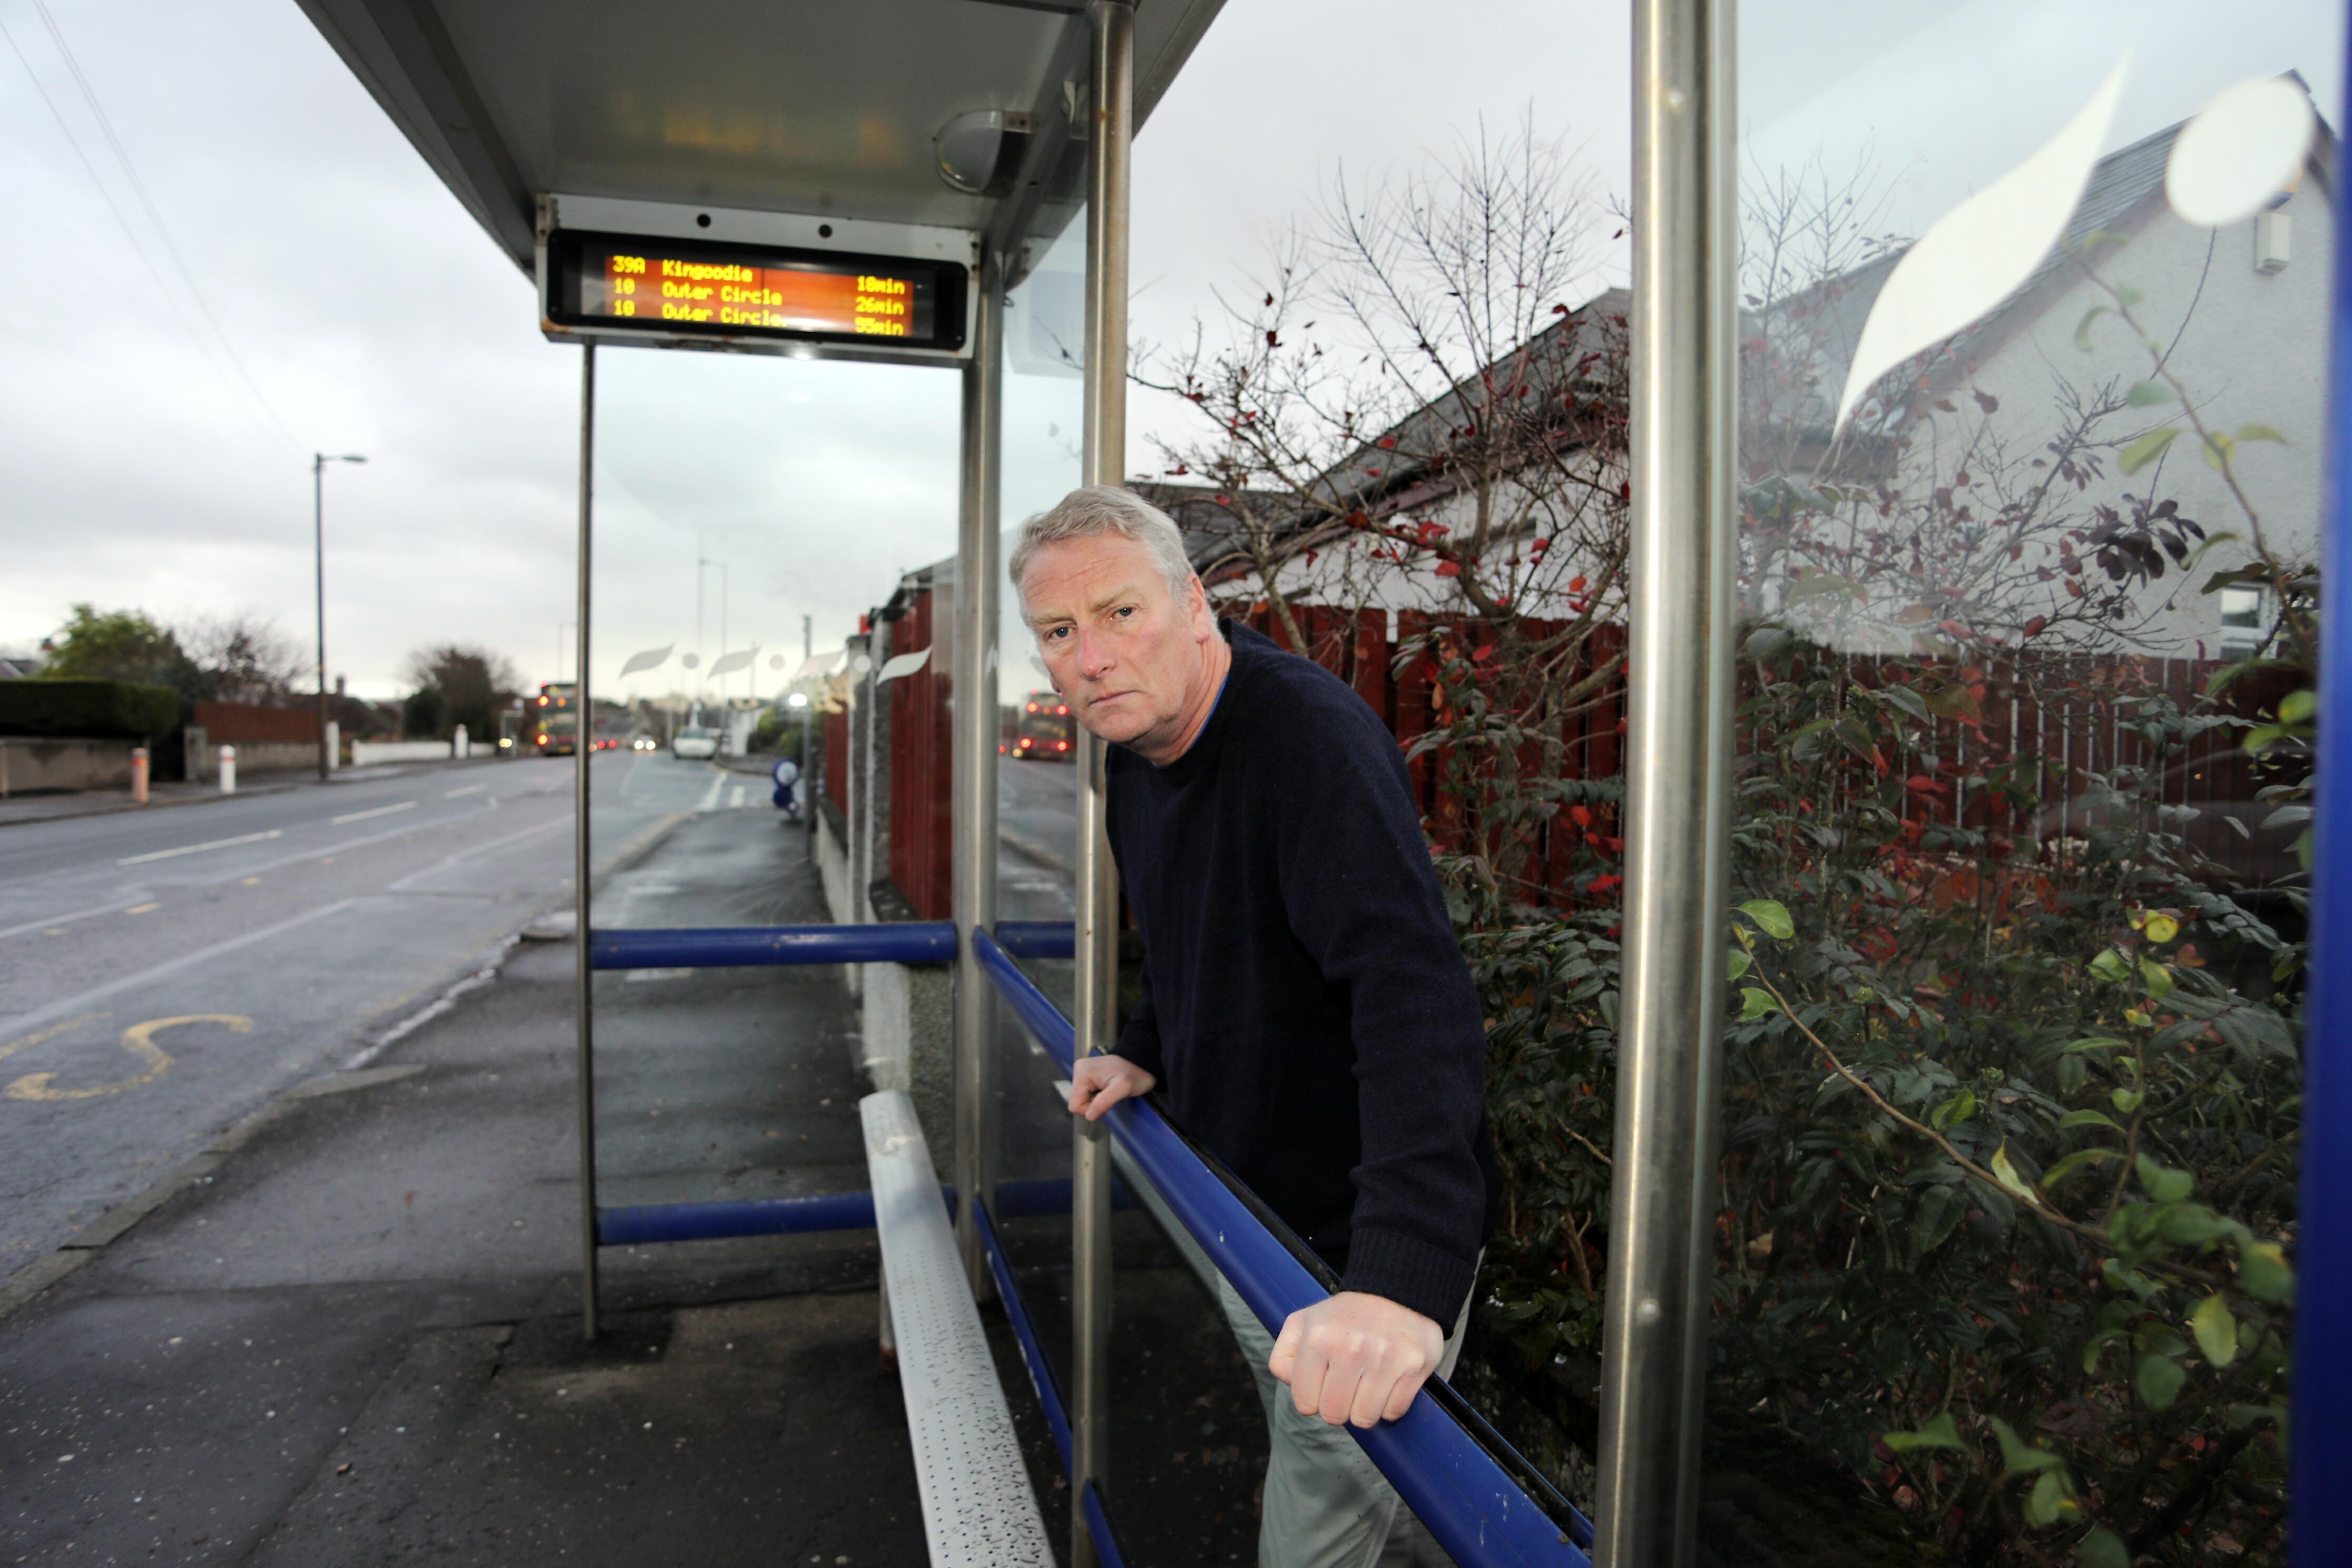 Councillor Craig Duncan at the bus shelter.